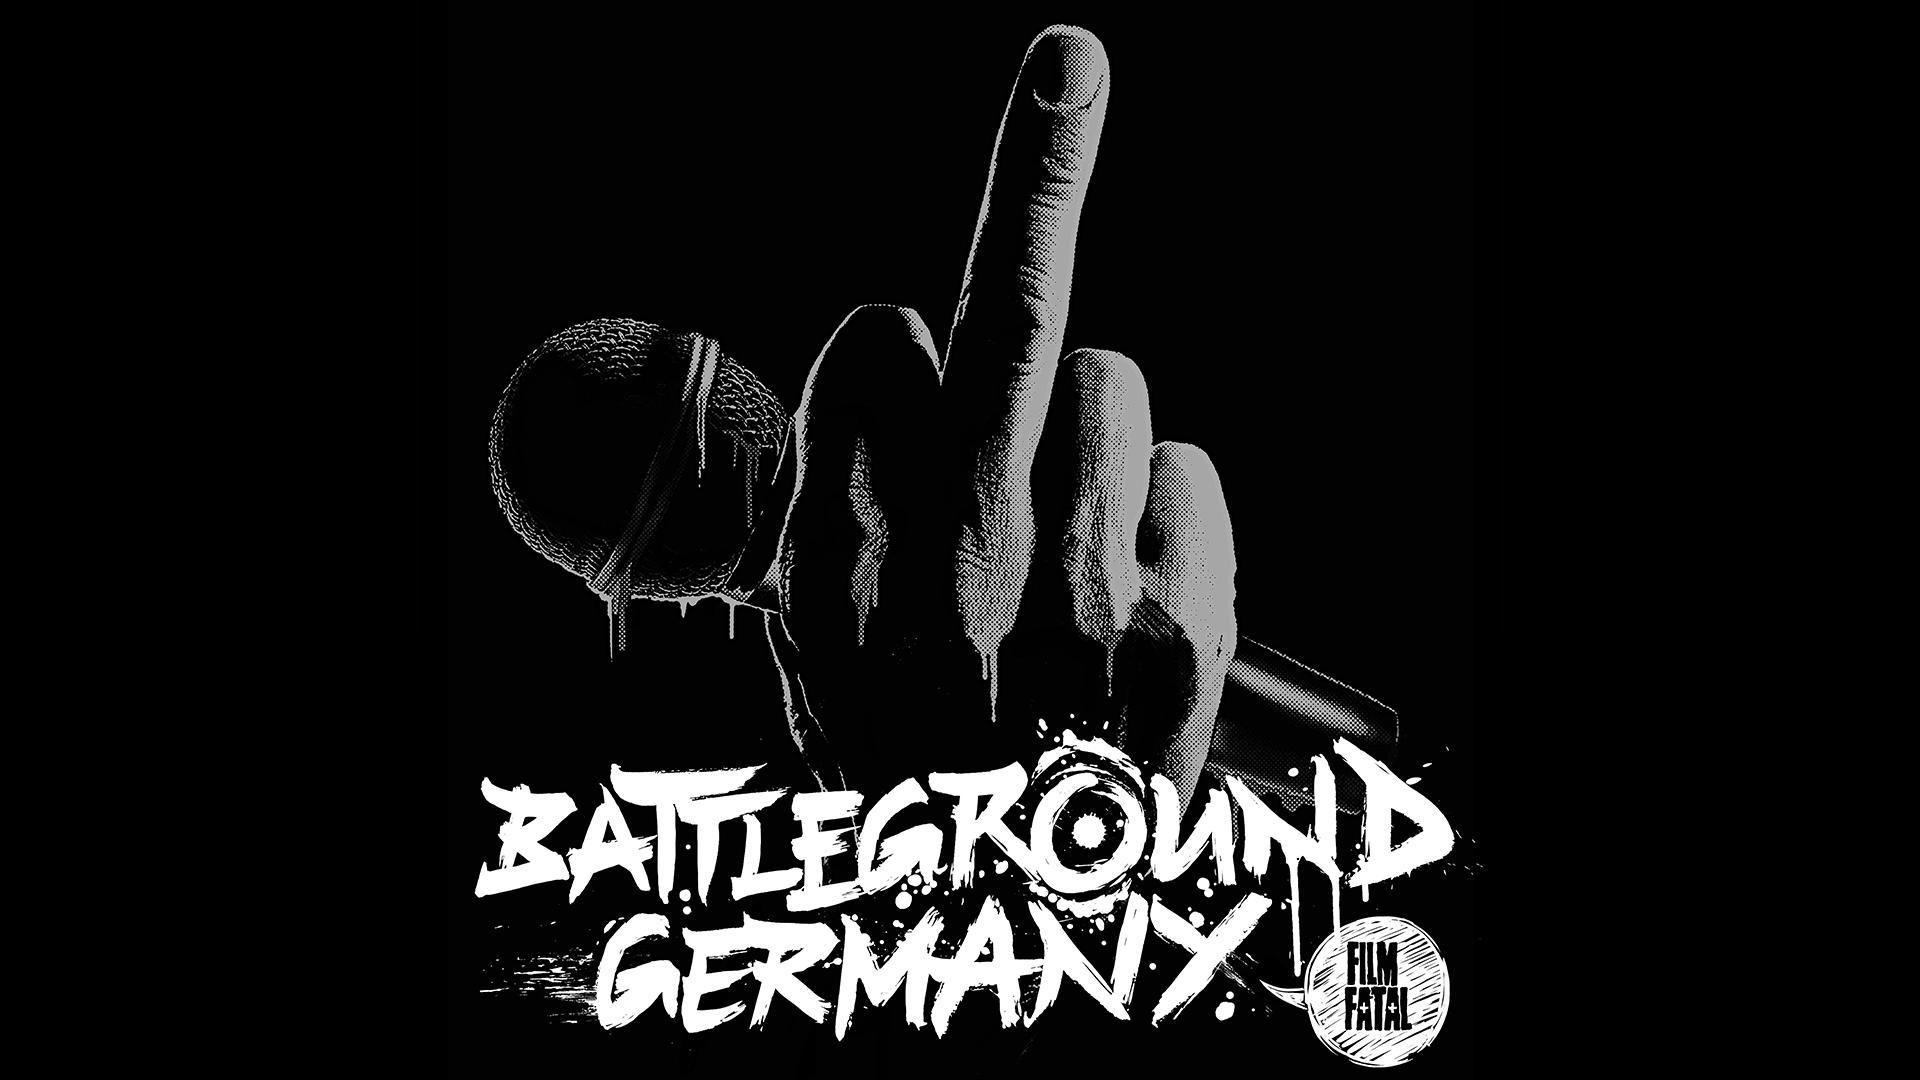 Battleground Germany